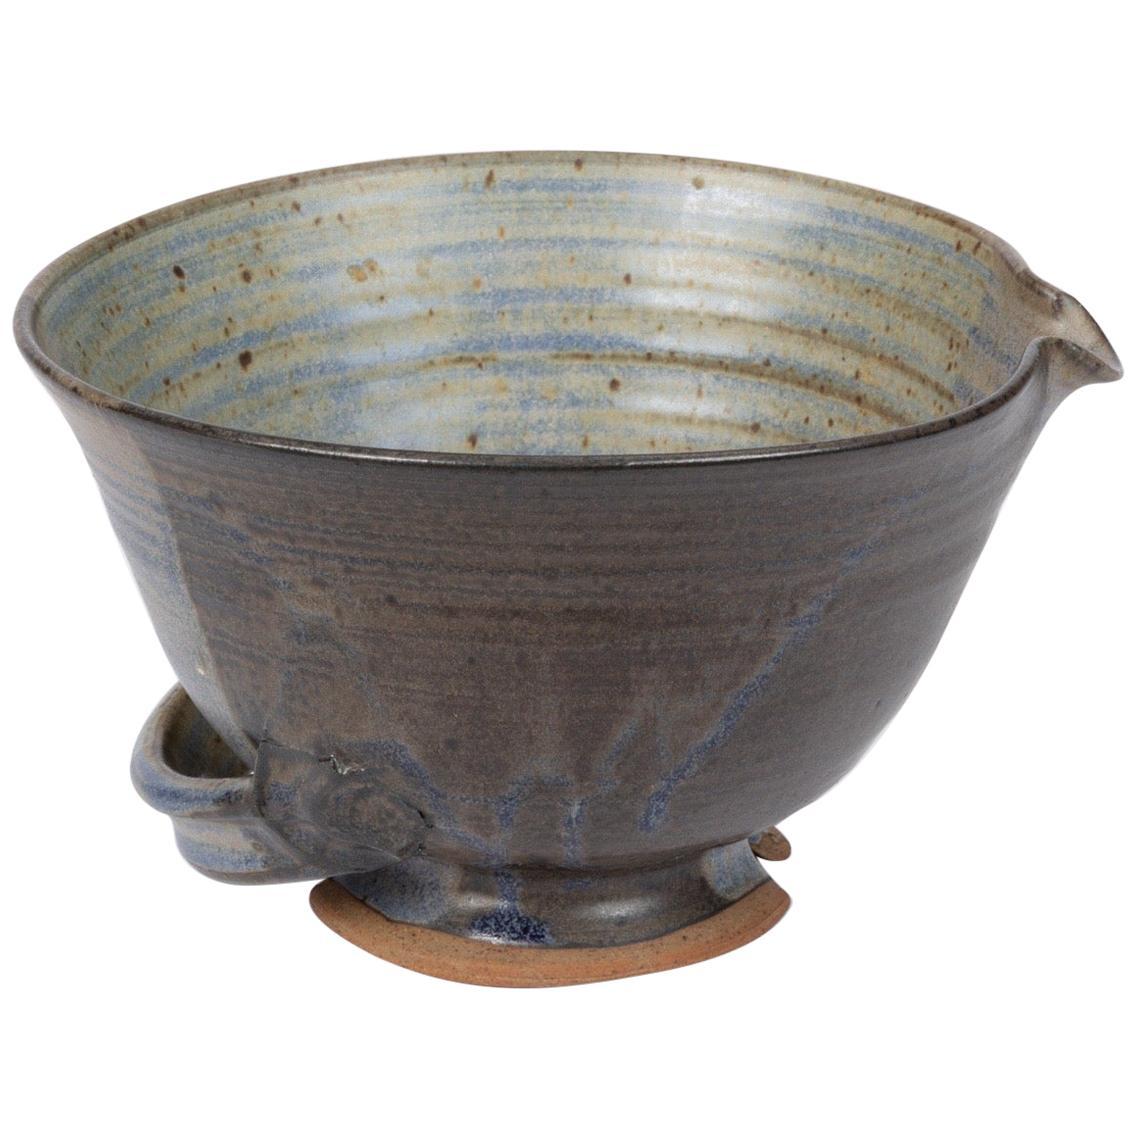 Colander Style Studio Pottery Bowl